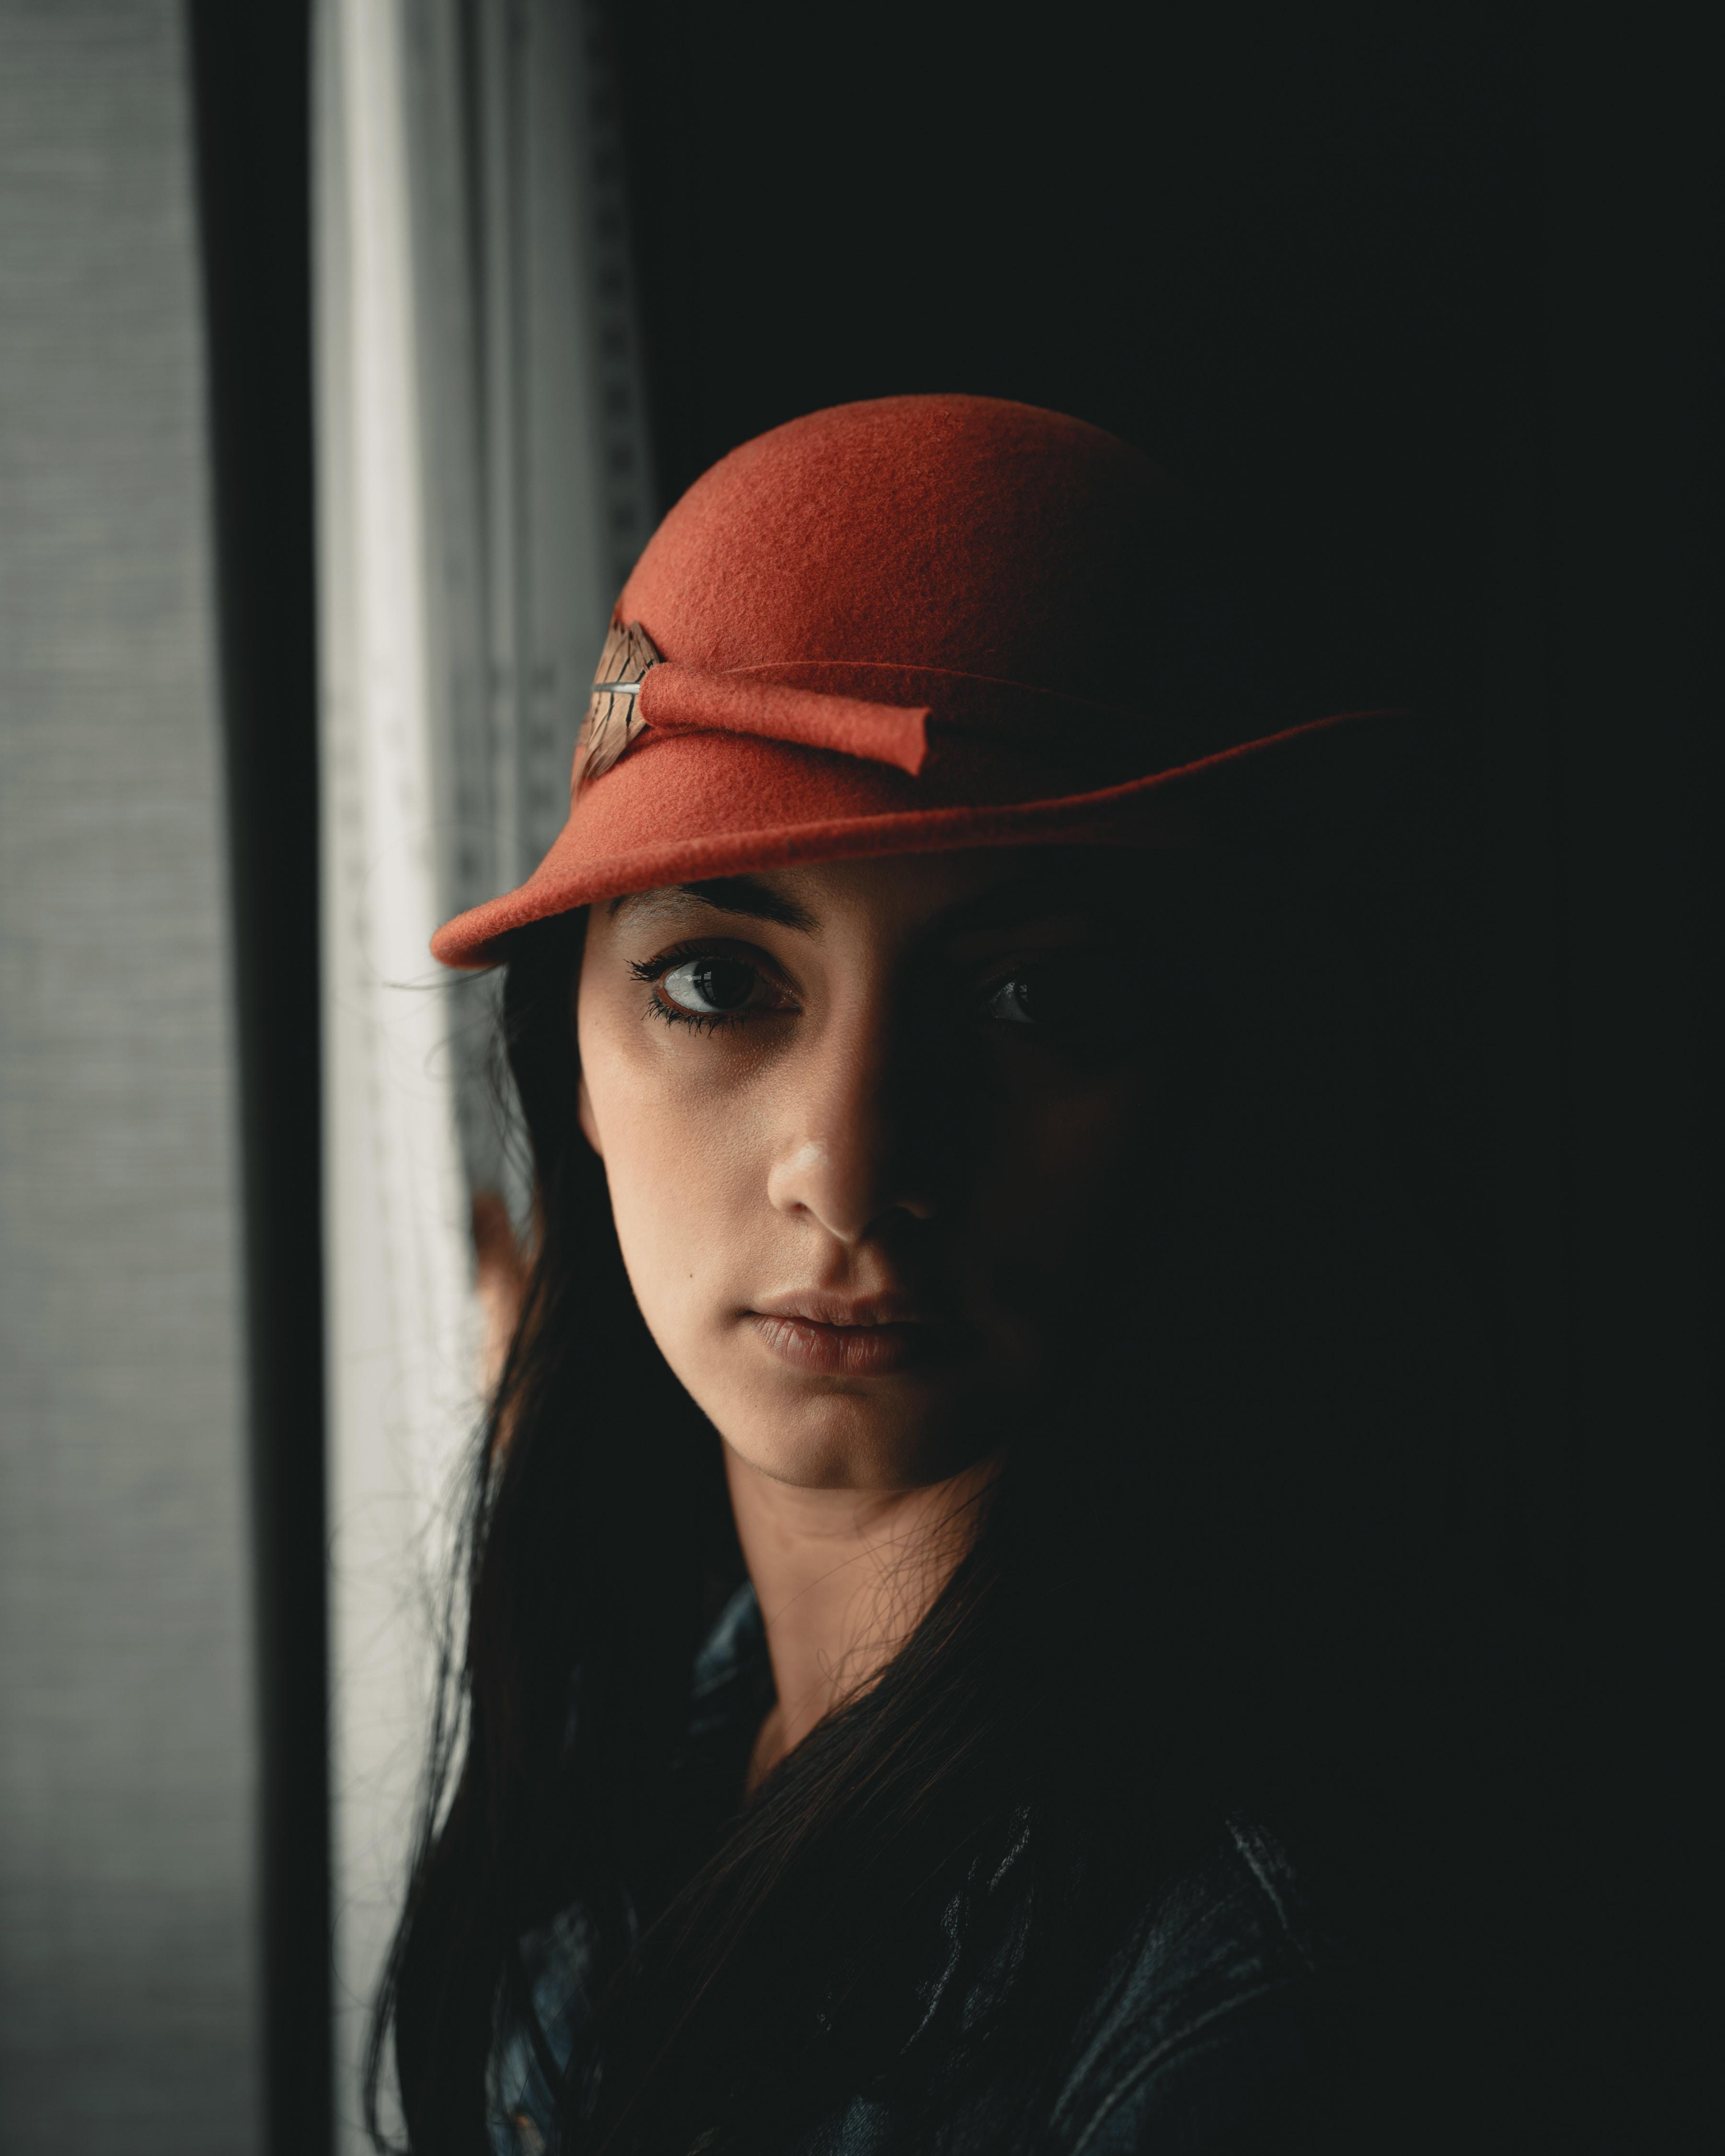 A fancy hat calls for a fancy photo